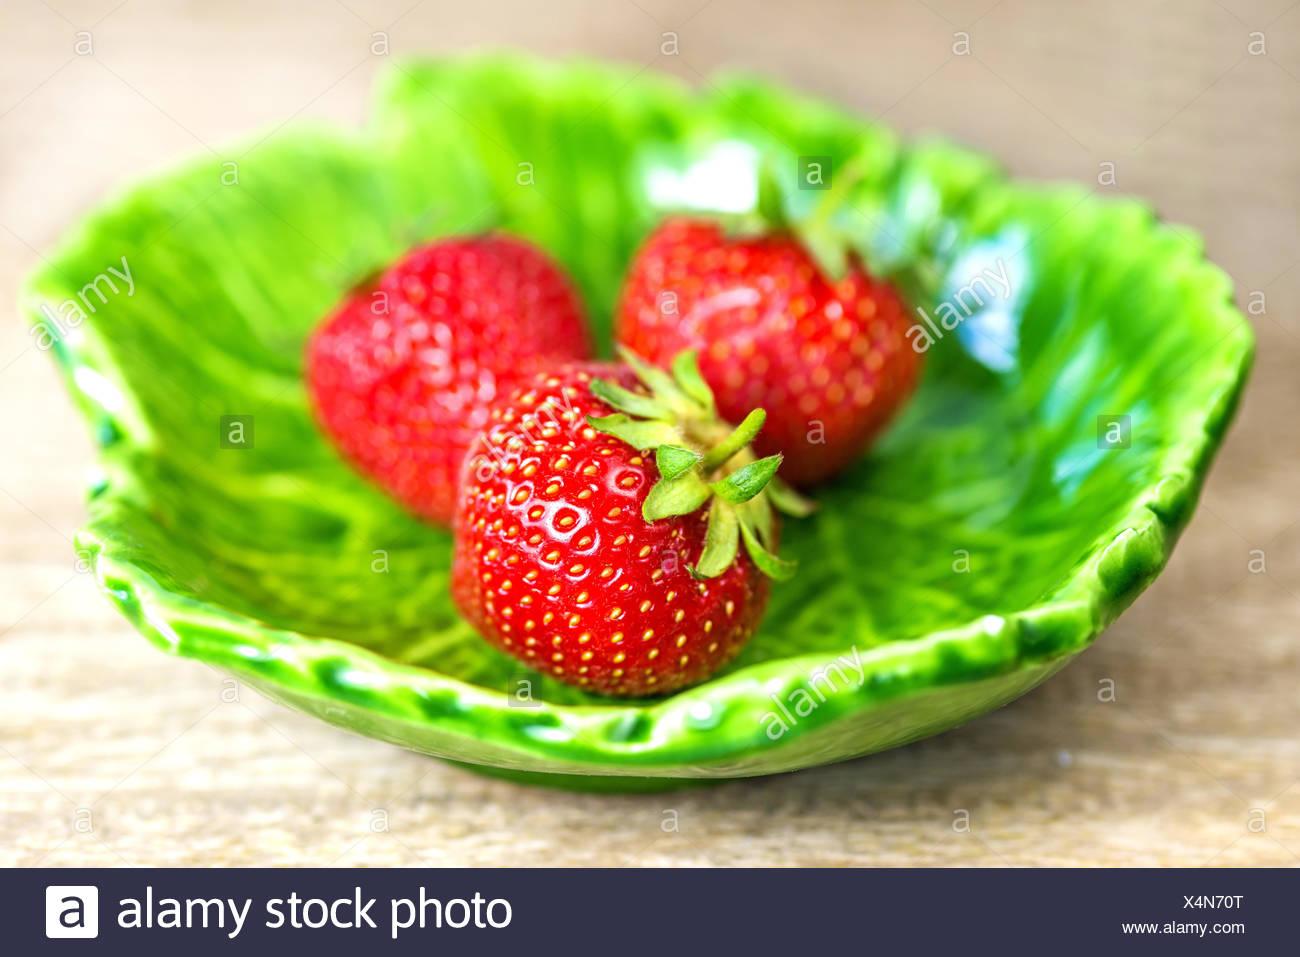 strawberry. - Stock Image